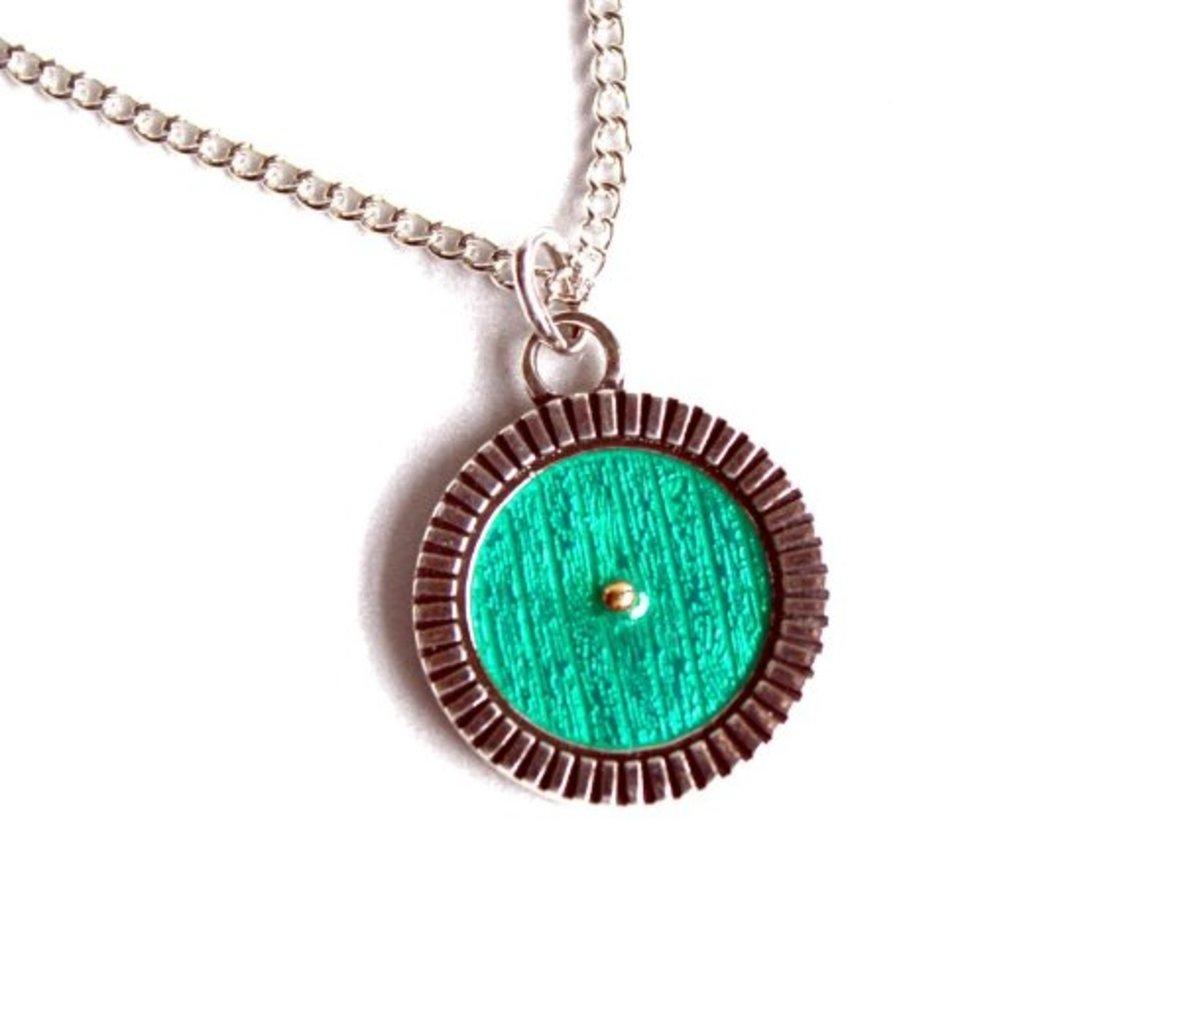 Bag End Door Pendant necklace